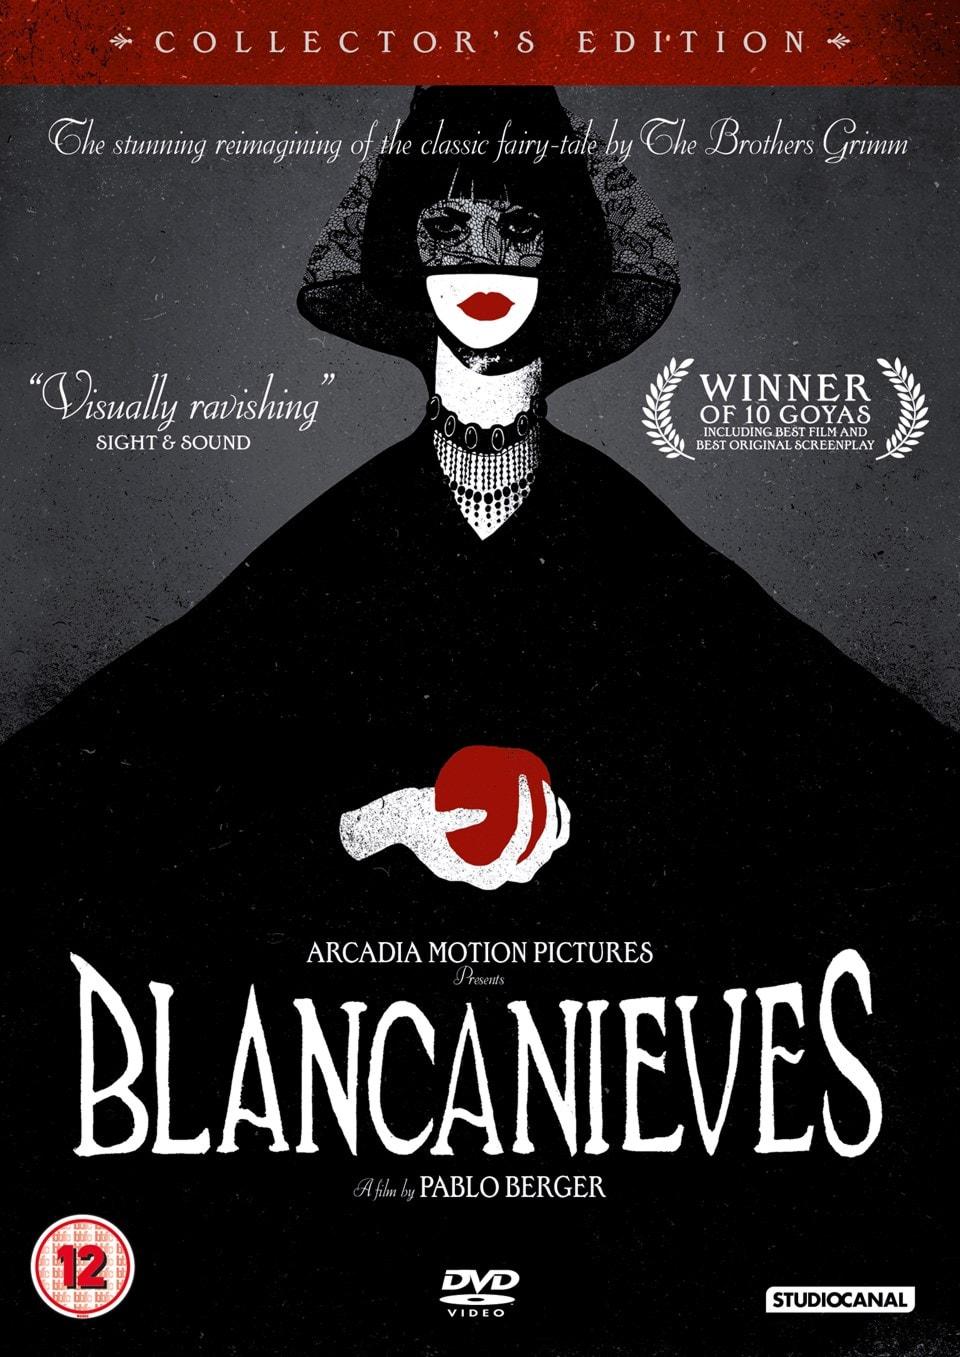 Blancanieves - 1